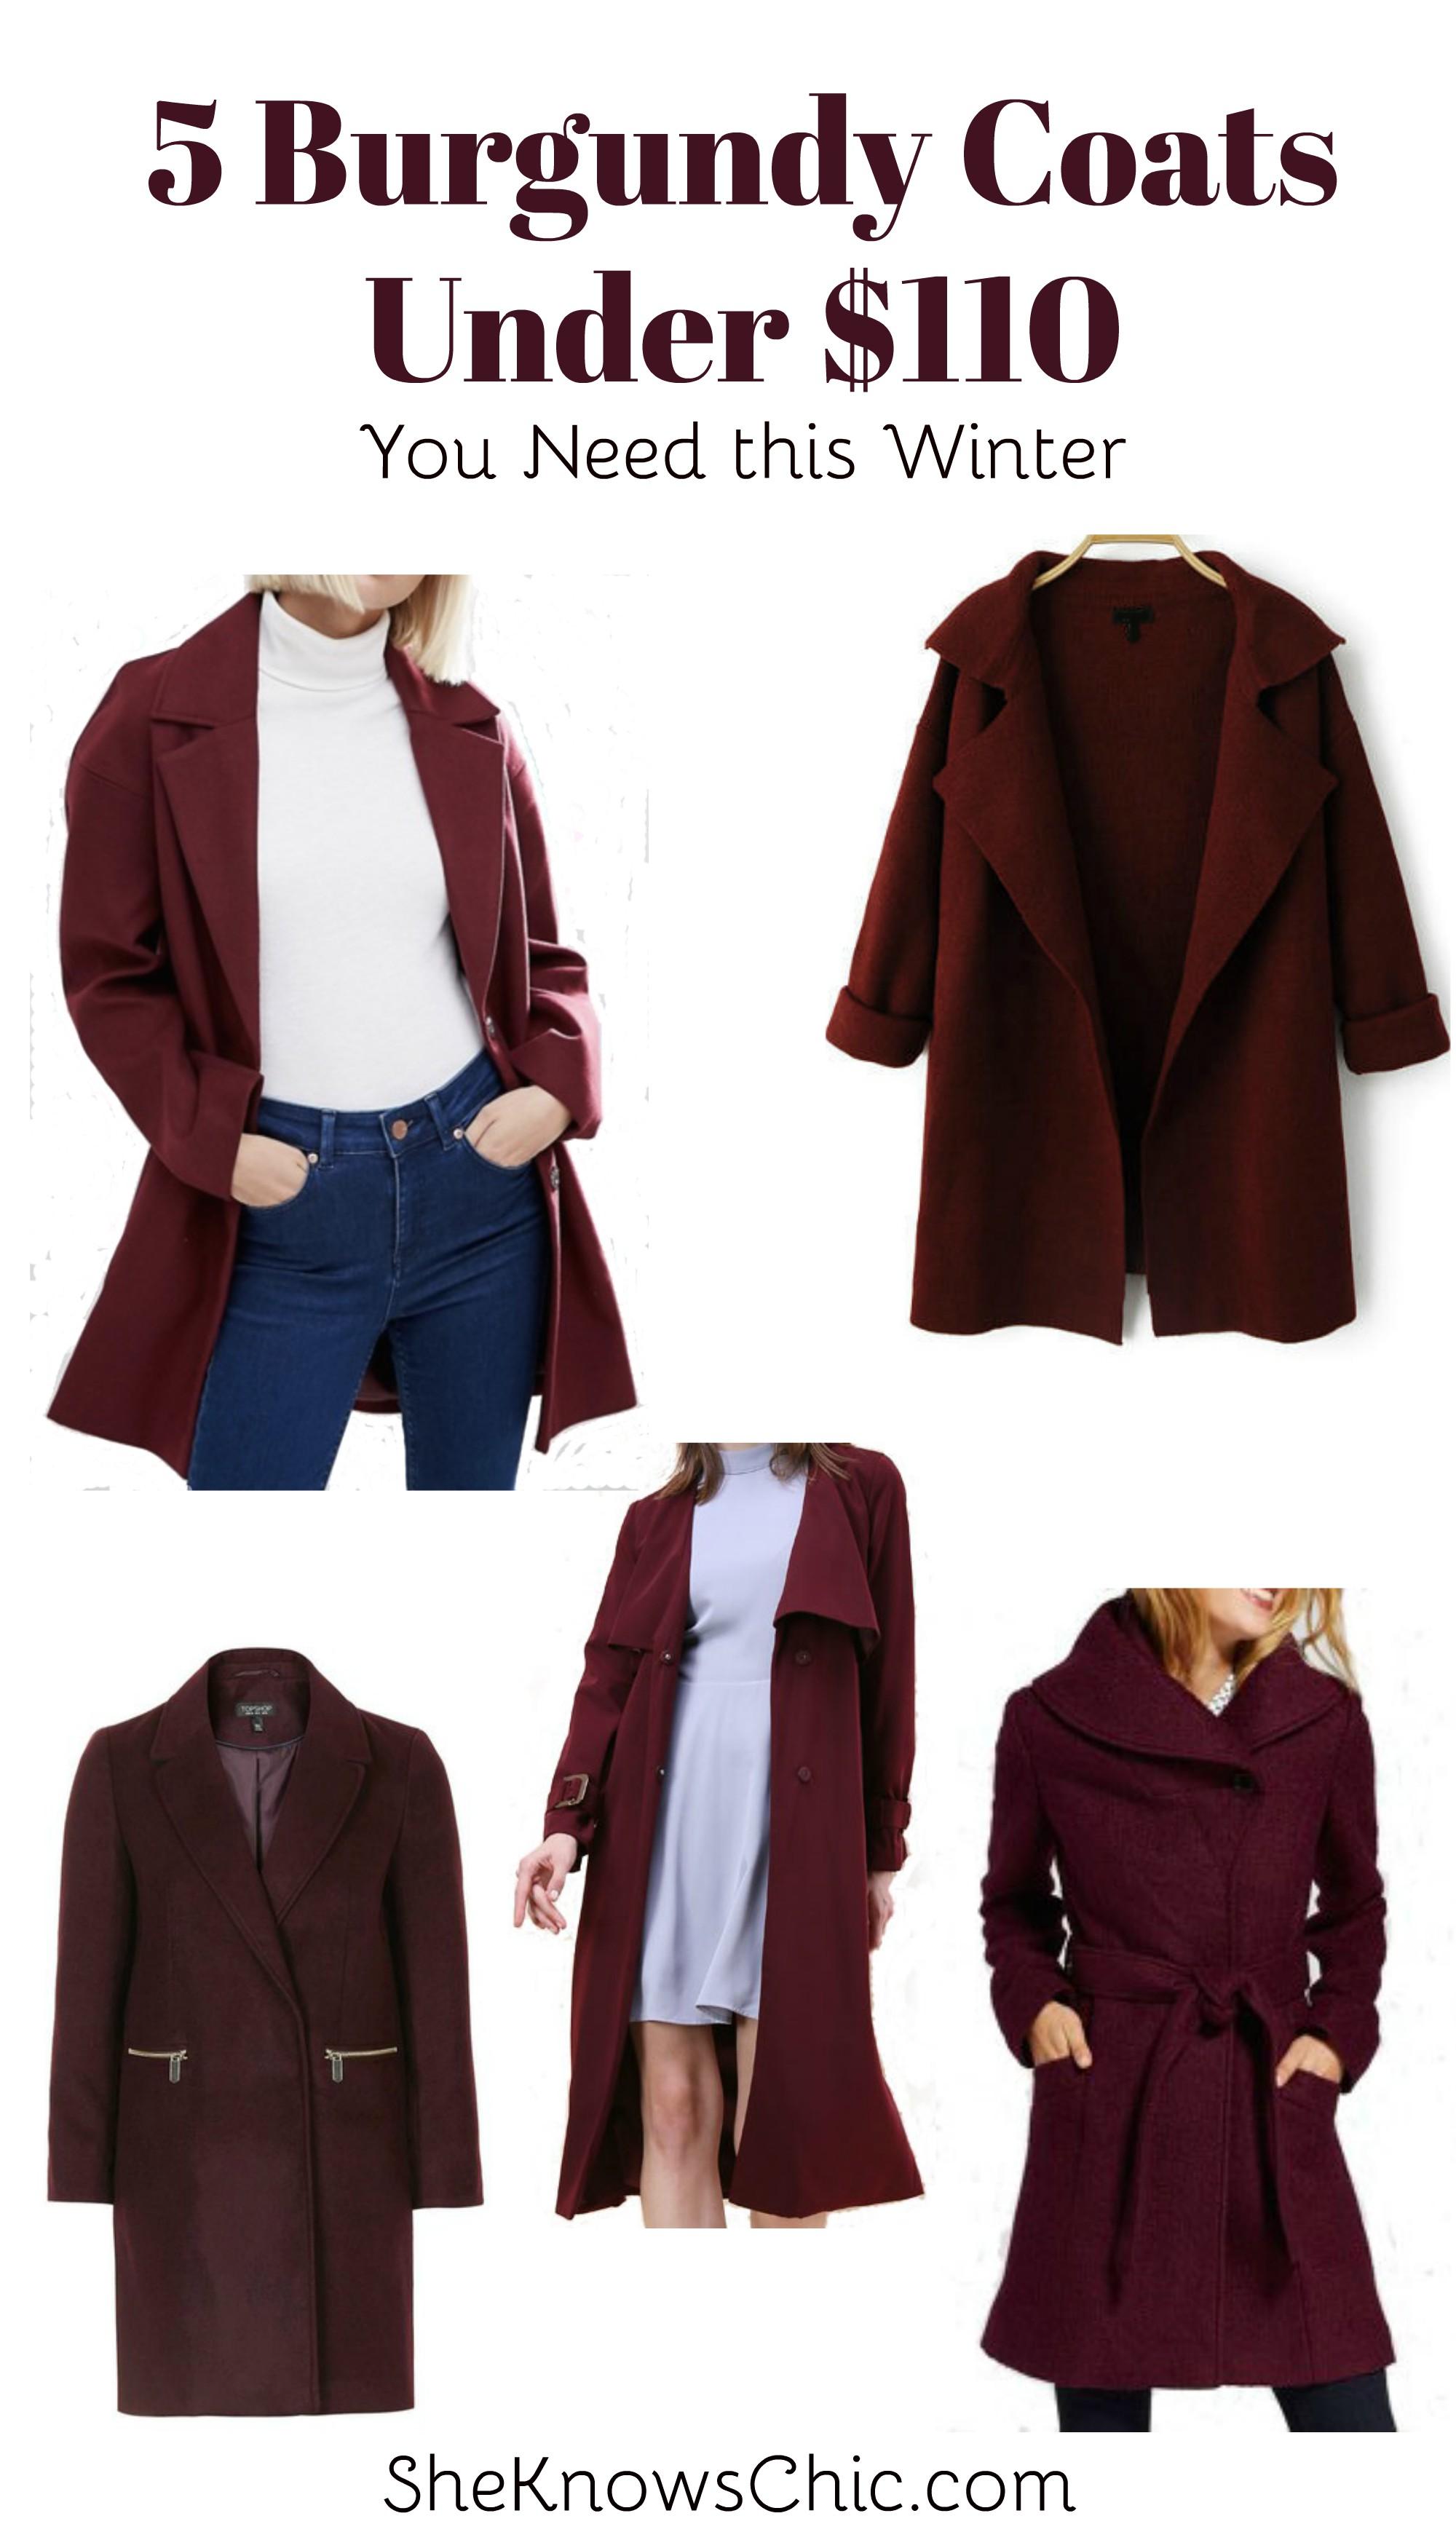 5 Burgundy Coats Under $110